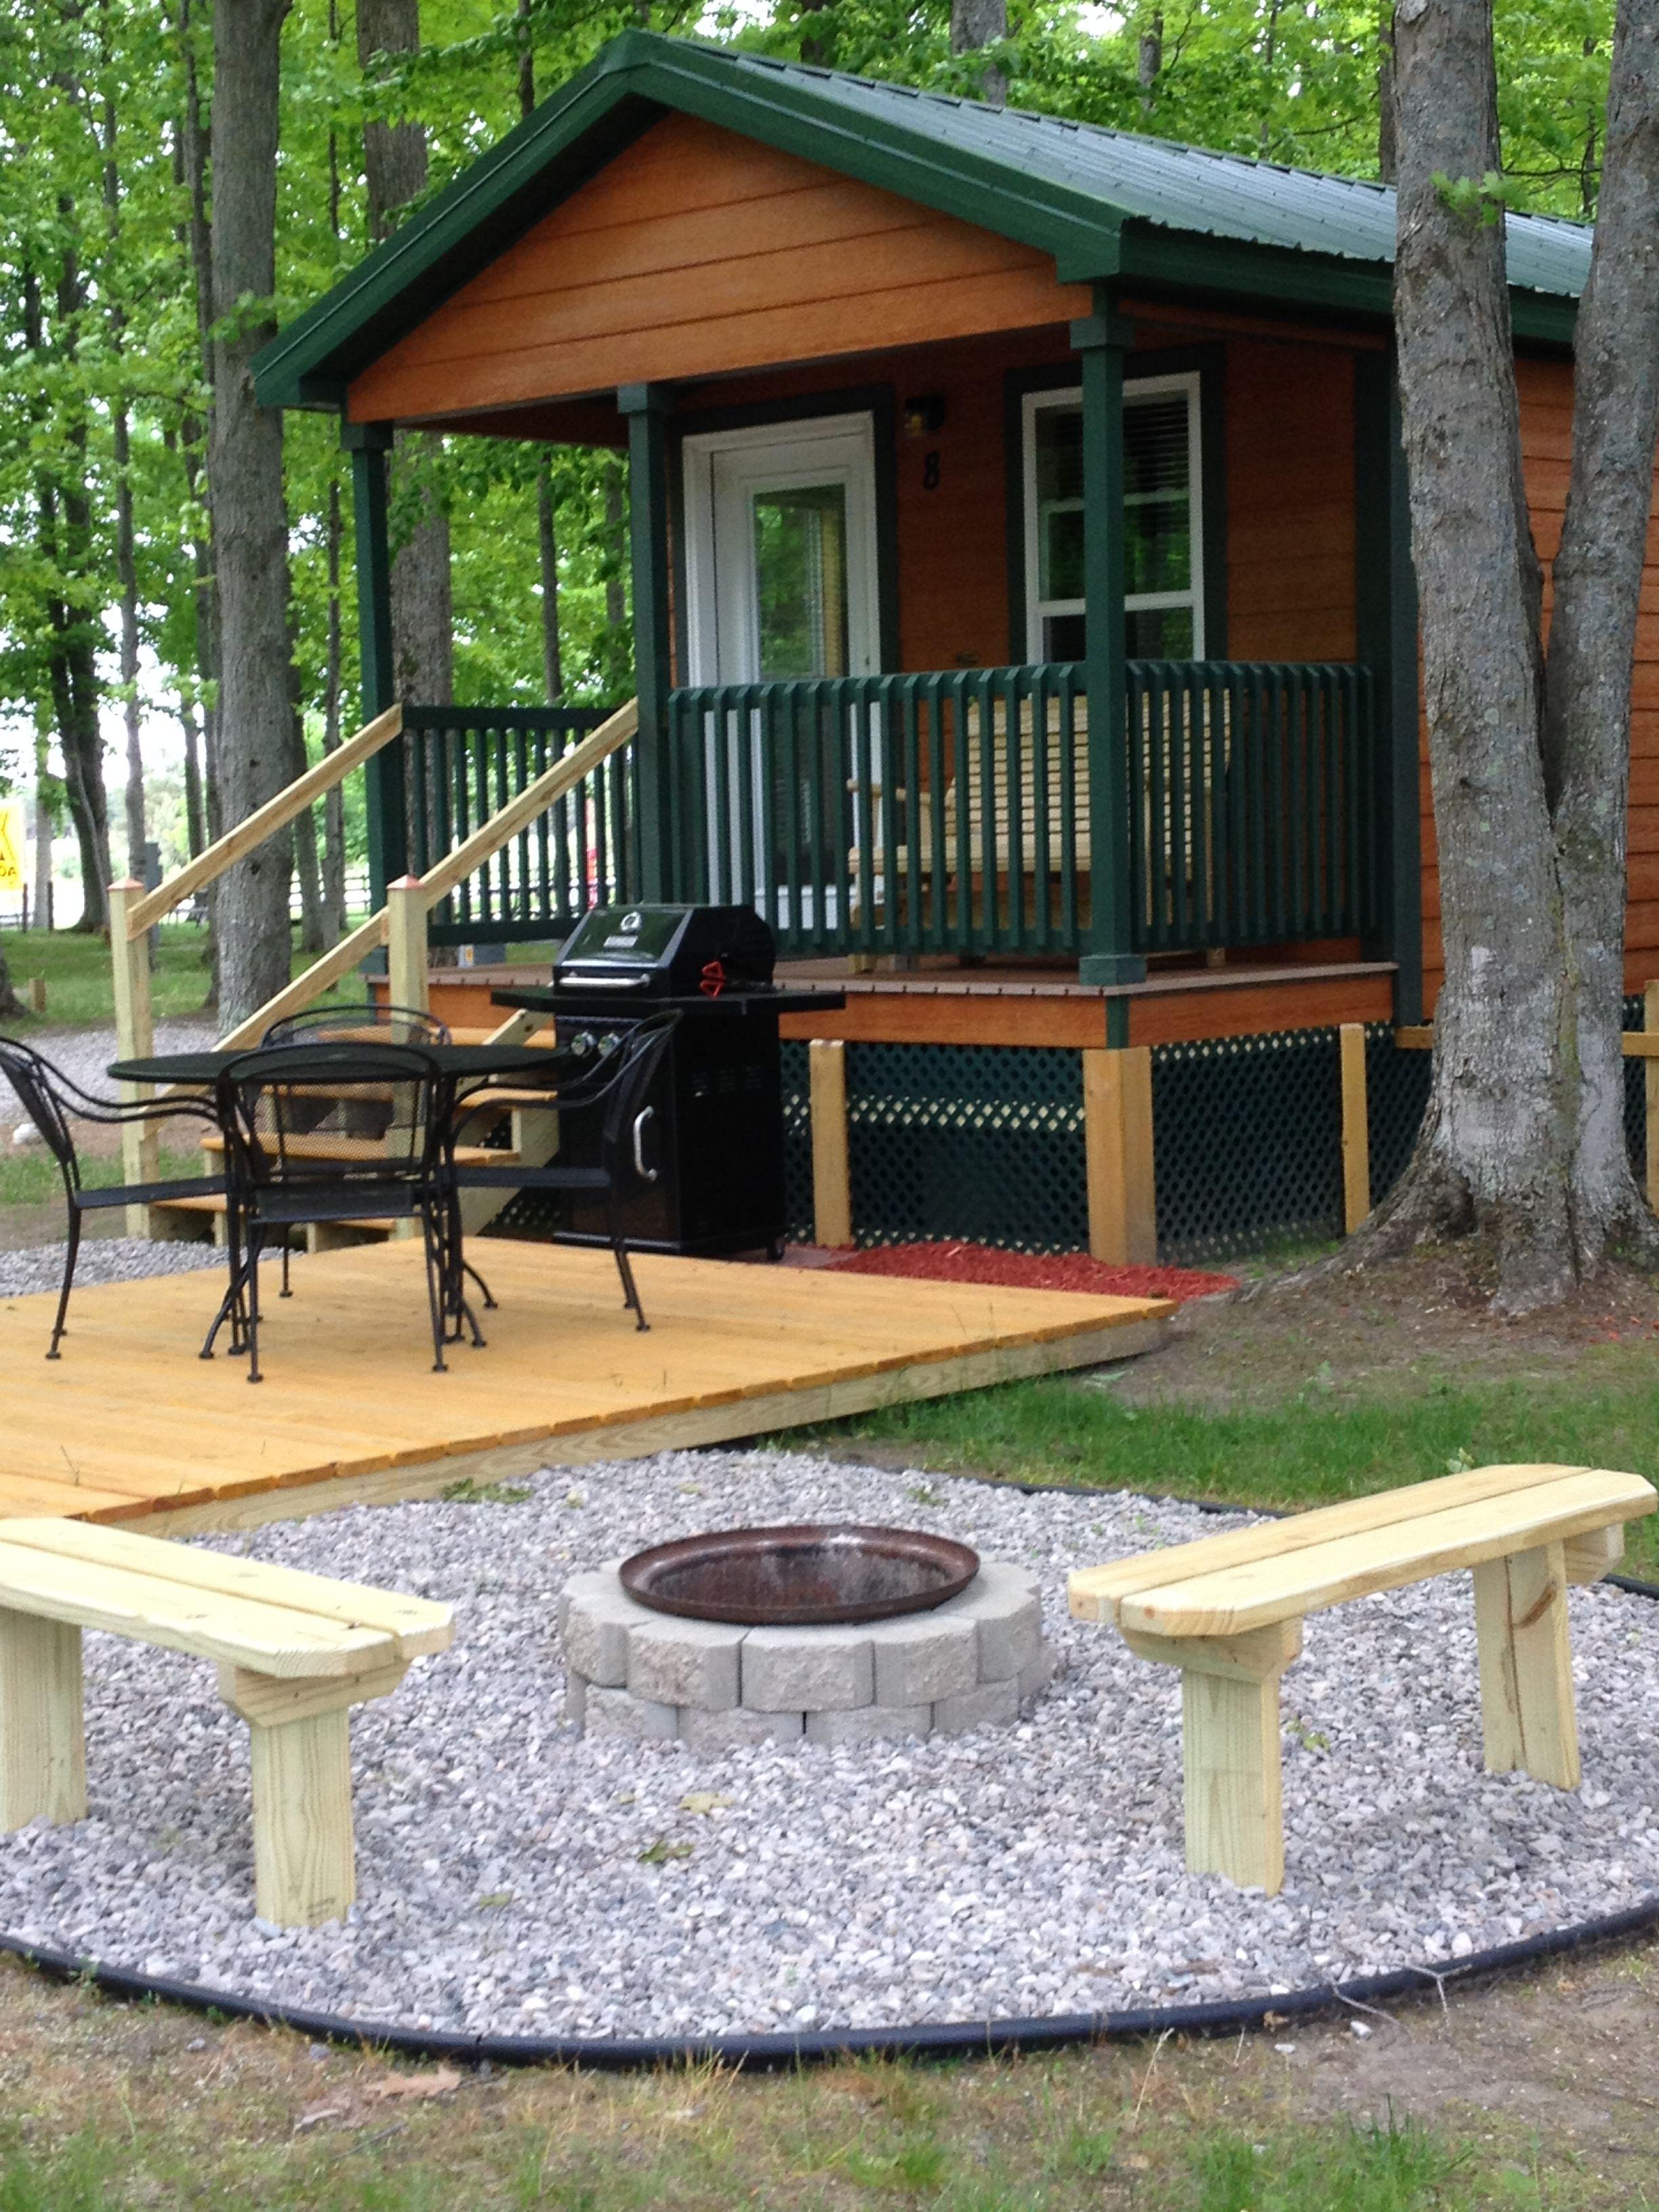 Deluxe Cabins And Lodges Traverse City Koa Traverse City Mi Michigan Campgrounds Michigan Vacations Traverse City Mi